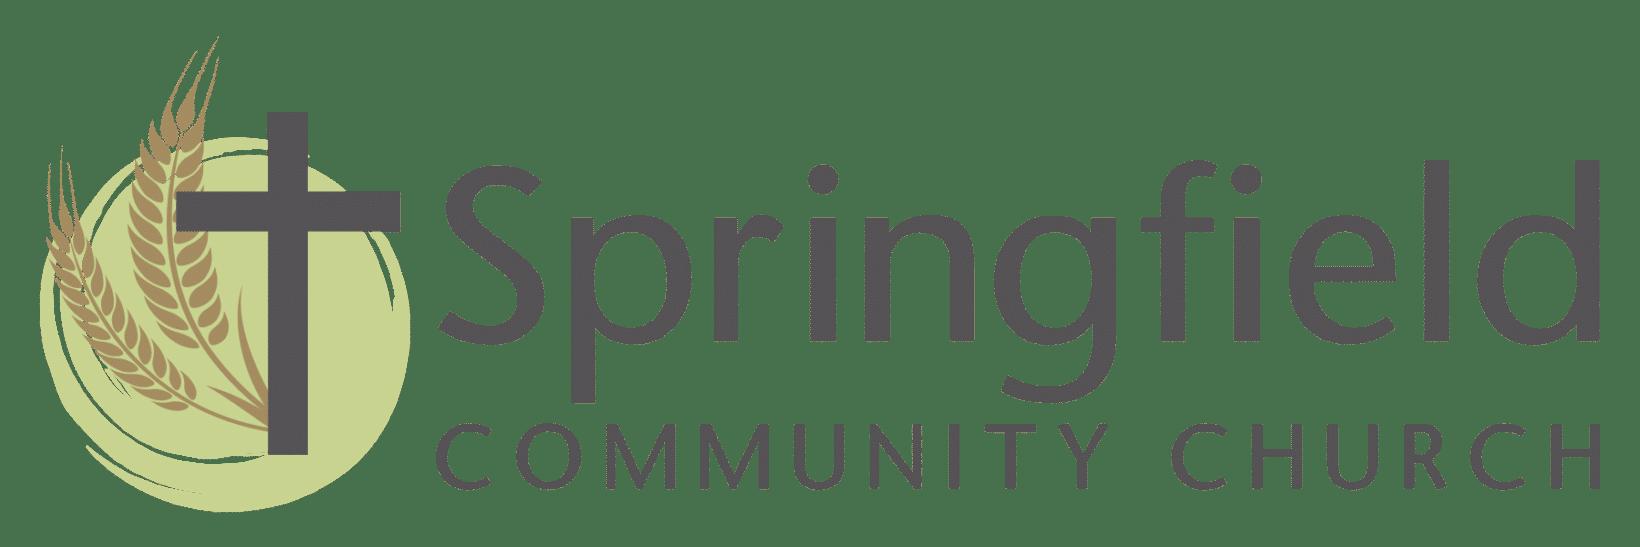 SpringfieldCommunityChurch_Logo